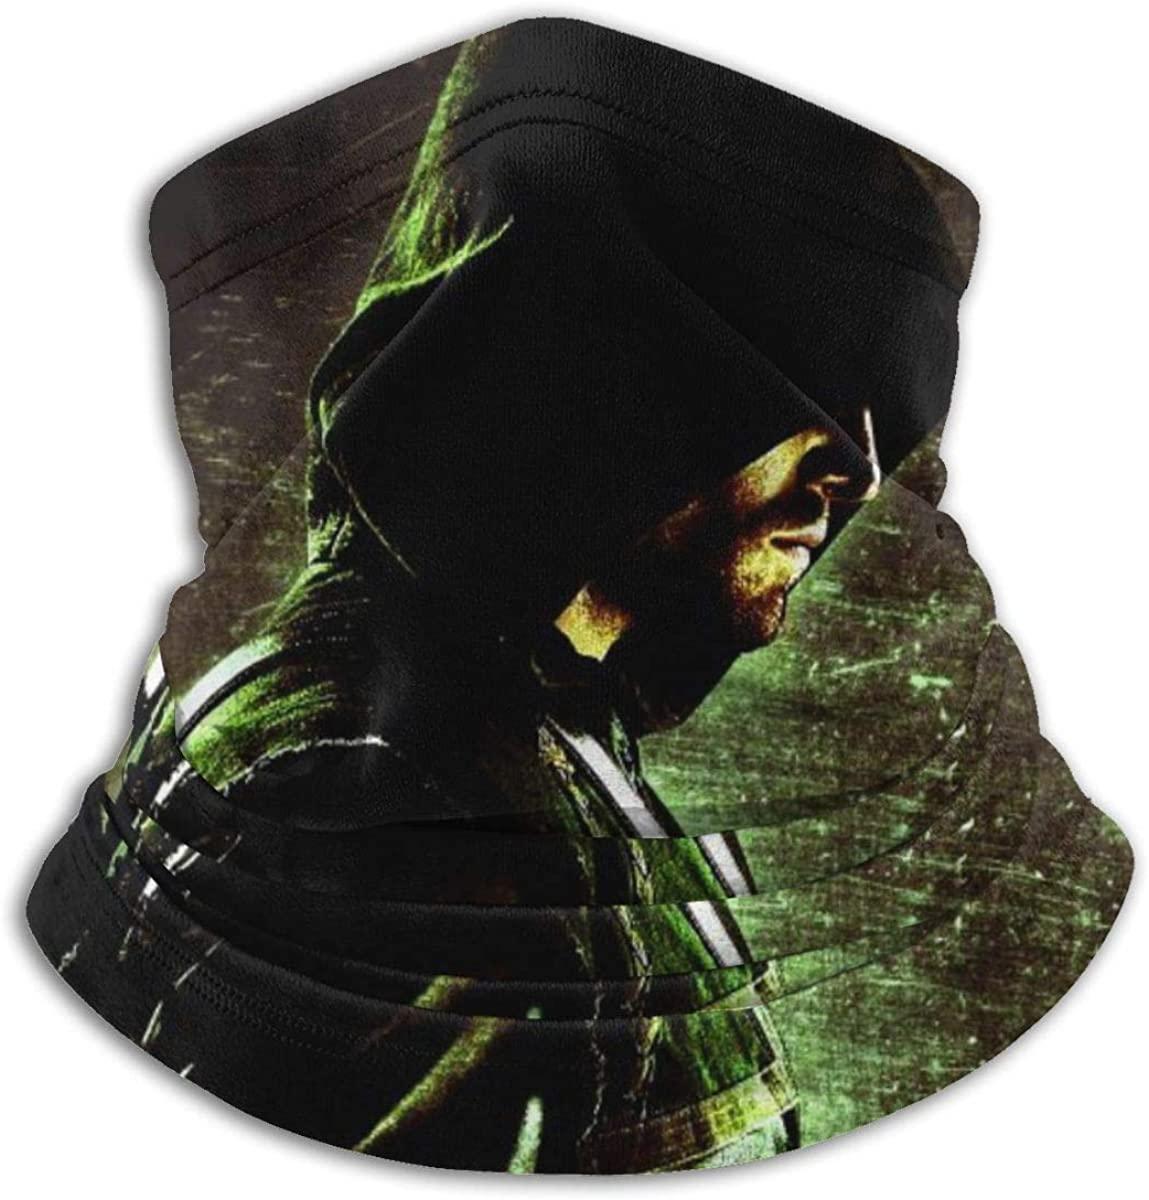 arr-ow Outdoor Bandanas Neck Gaiter Face Scarf Shield Neck Covers for Men& Women